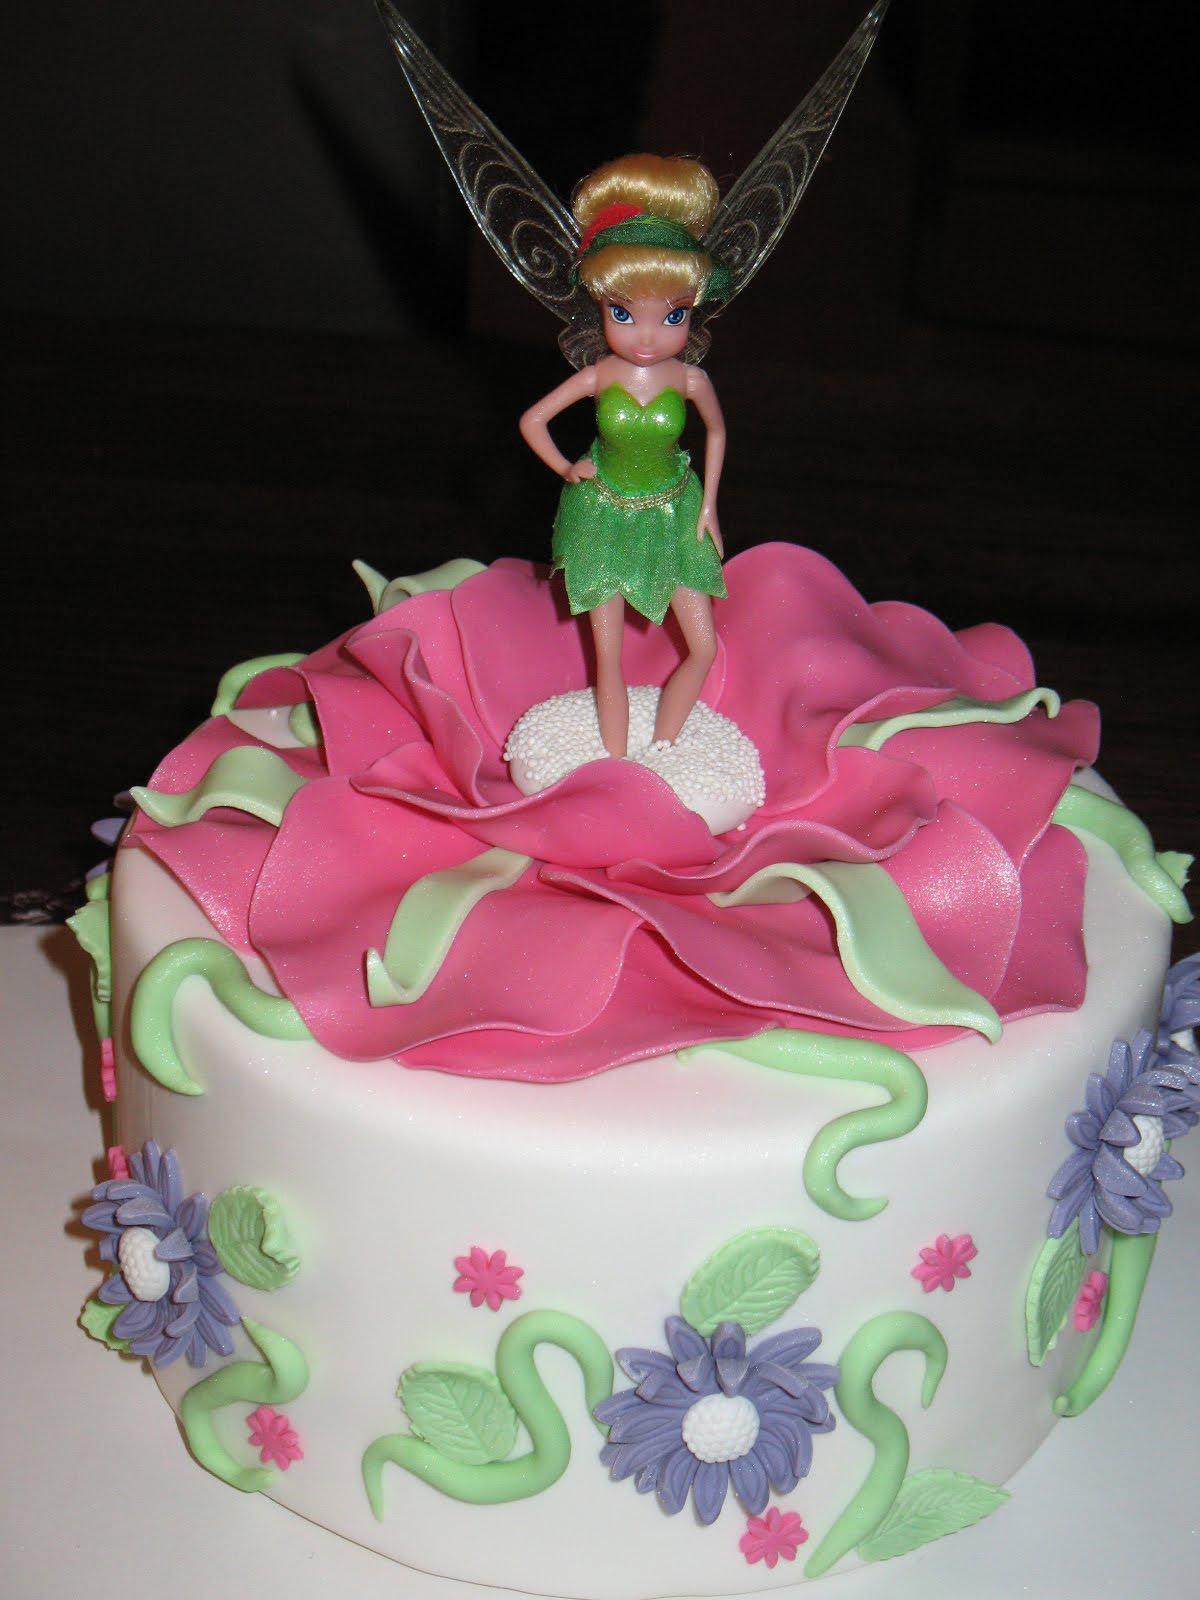 Groovy Tinkerbell Cakes Decoration Ideas Little Birthday Cakes Funny Birthday Cards Online Alyptdamsfinfo